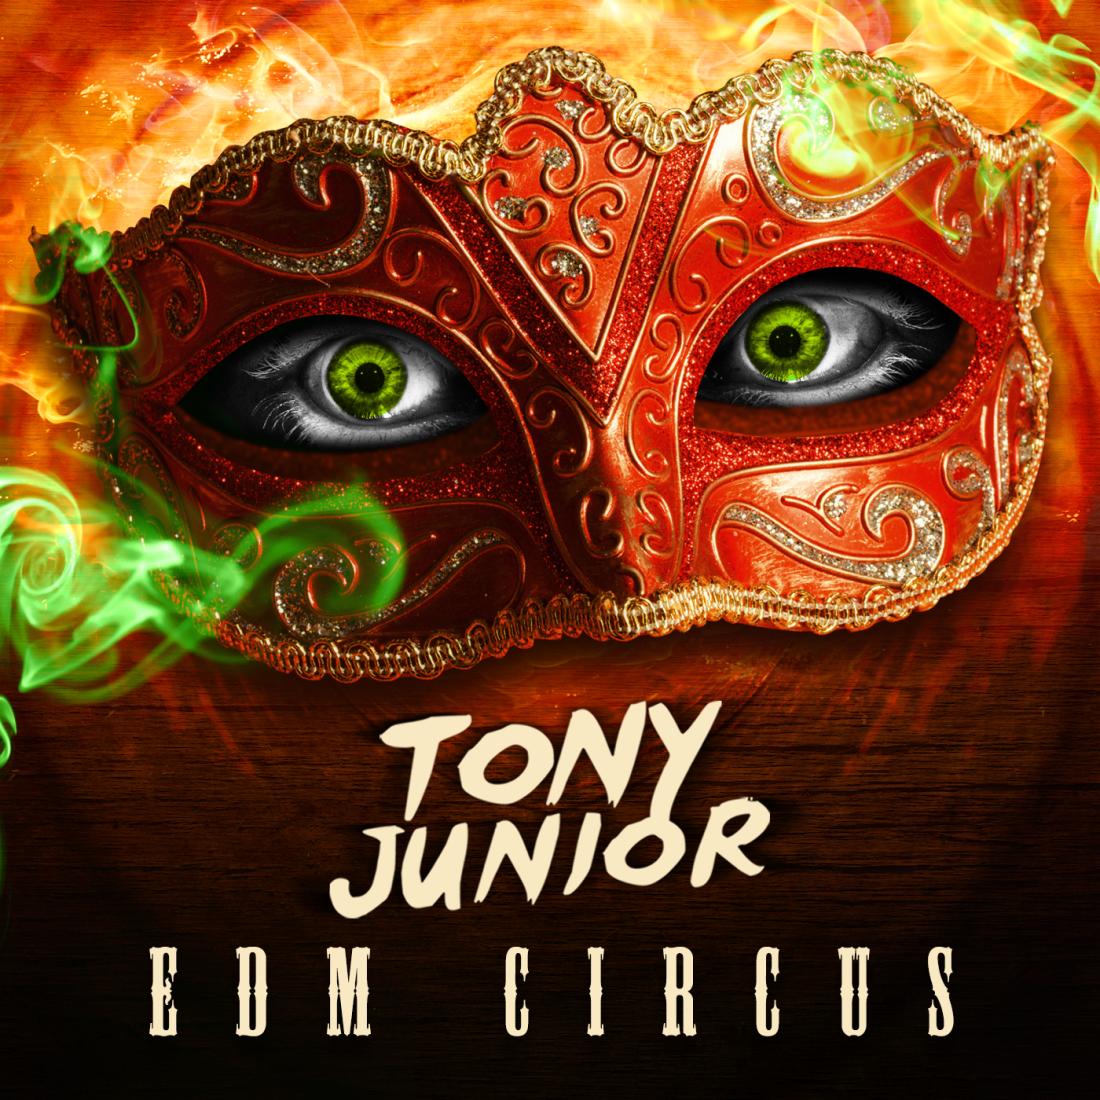 Tony Junior - EDM Circus artwork